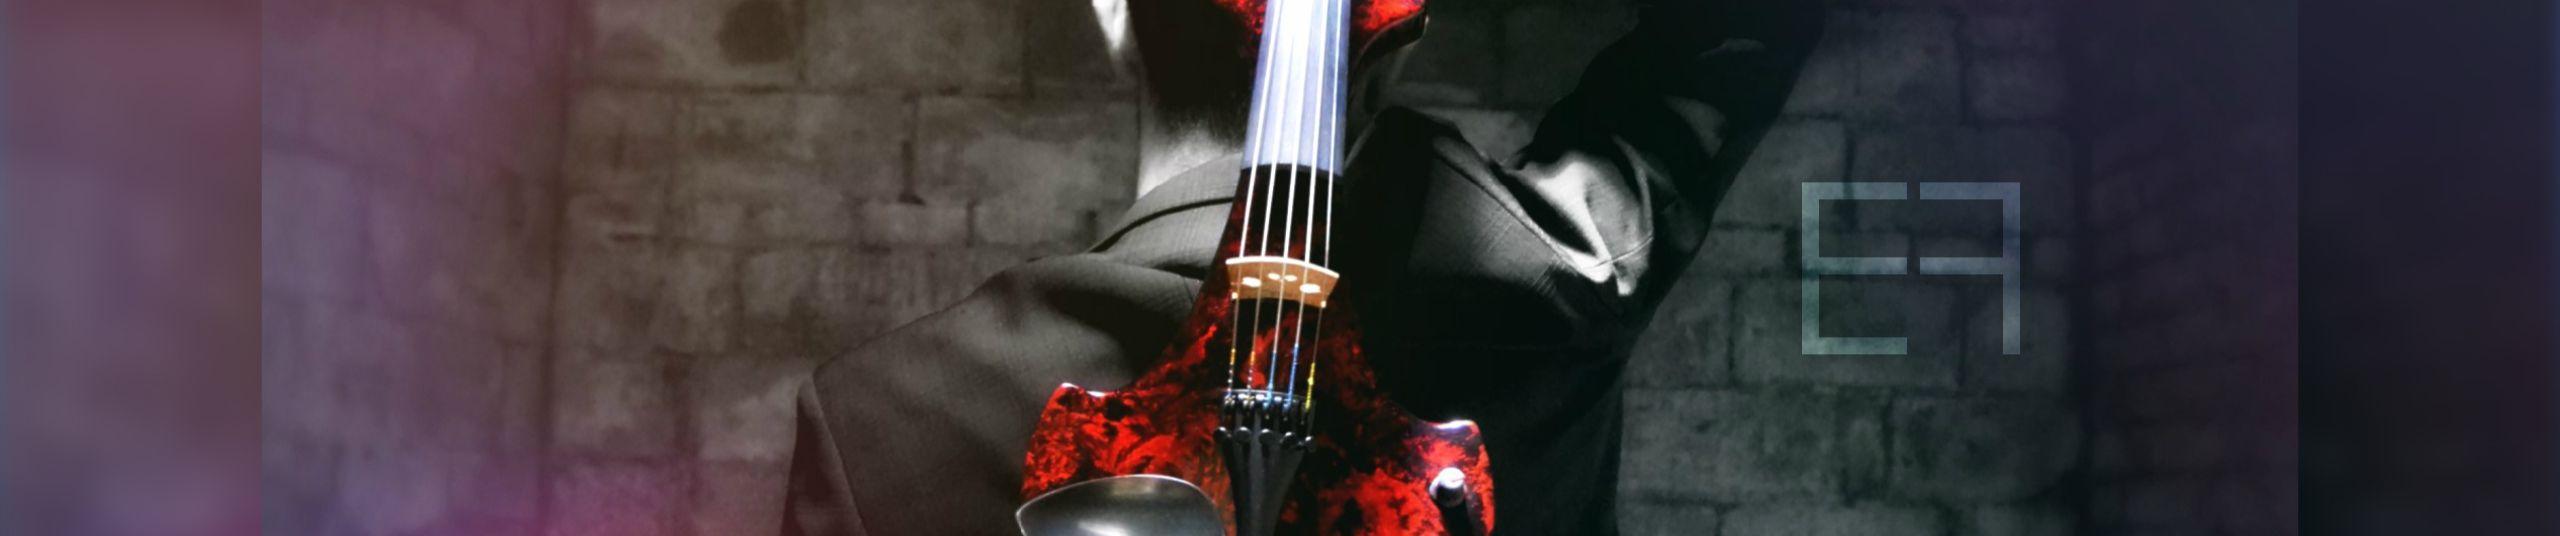 Chandelier - Sia - Violin Cover by Eduard Freixa | Free Listening ...